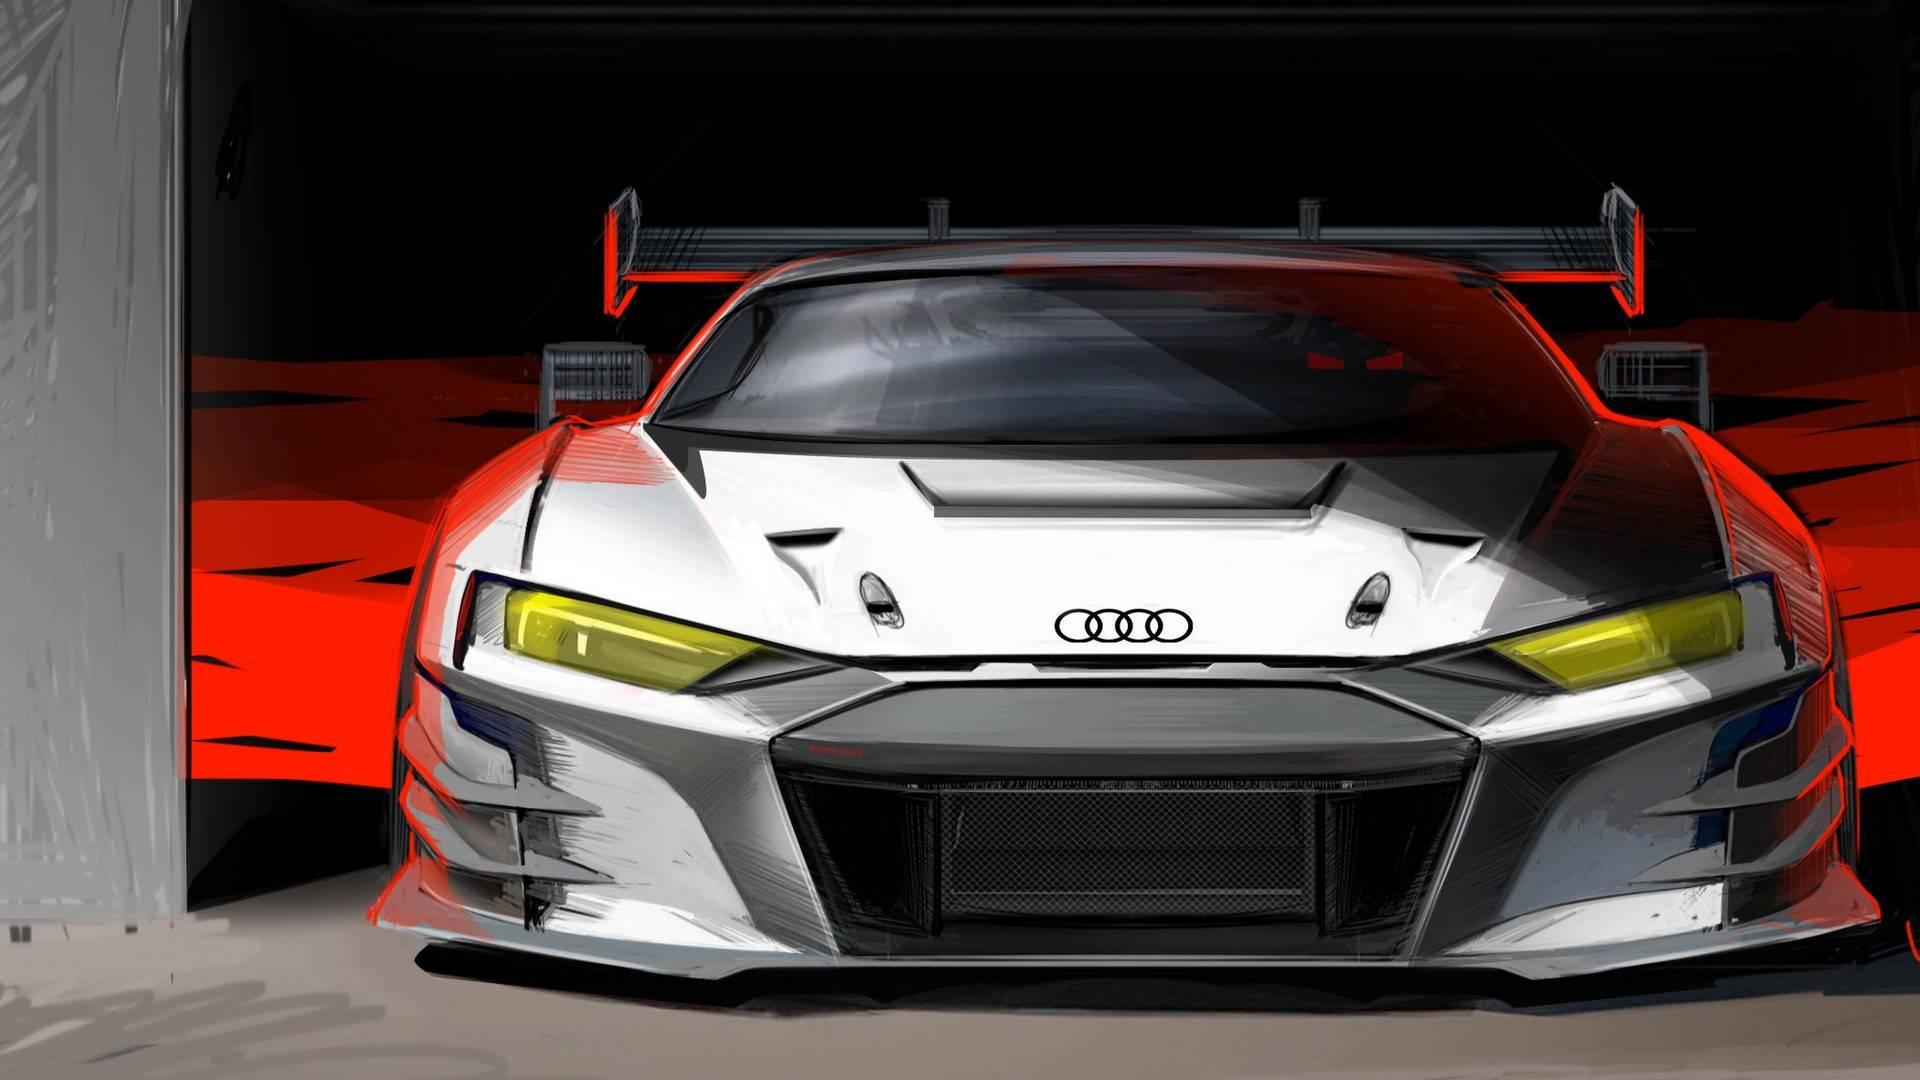 Audi R8 Lms Gt3 10 Suv News And Analysis